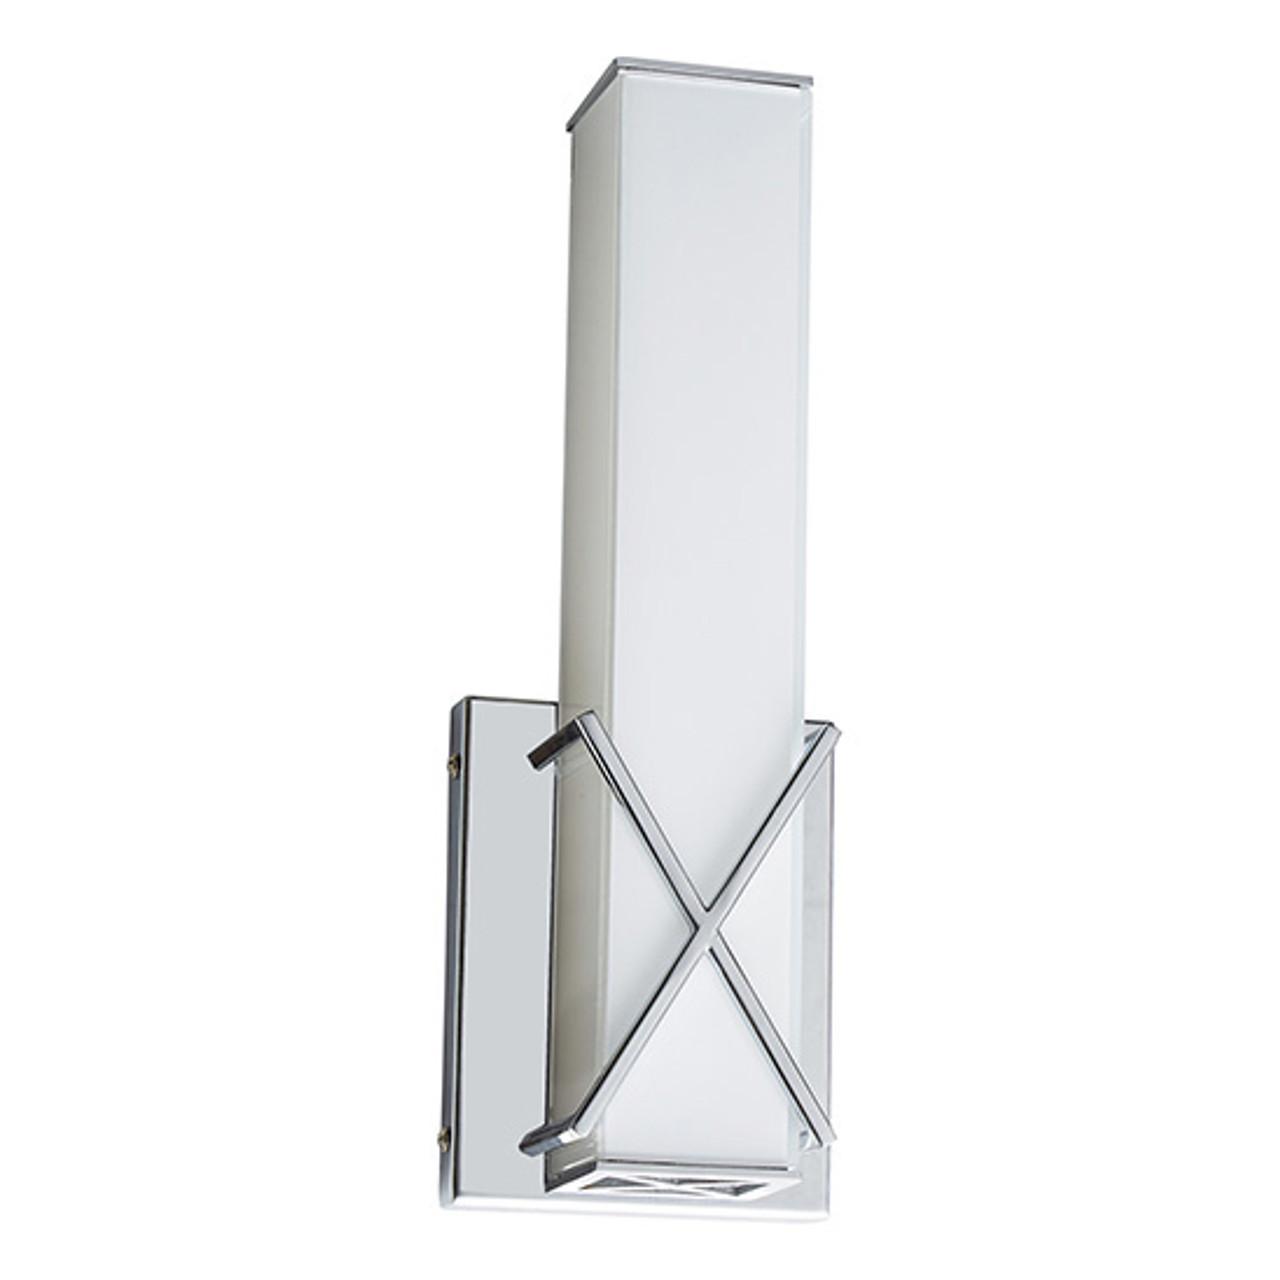 Chrome Vanity Light, WS412 – 14W - 3000K